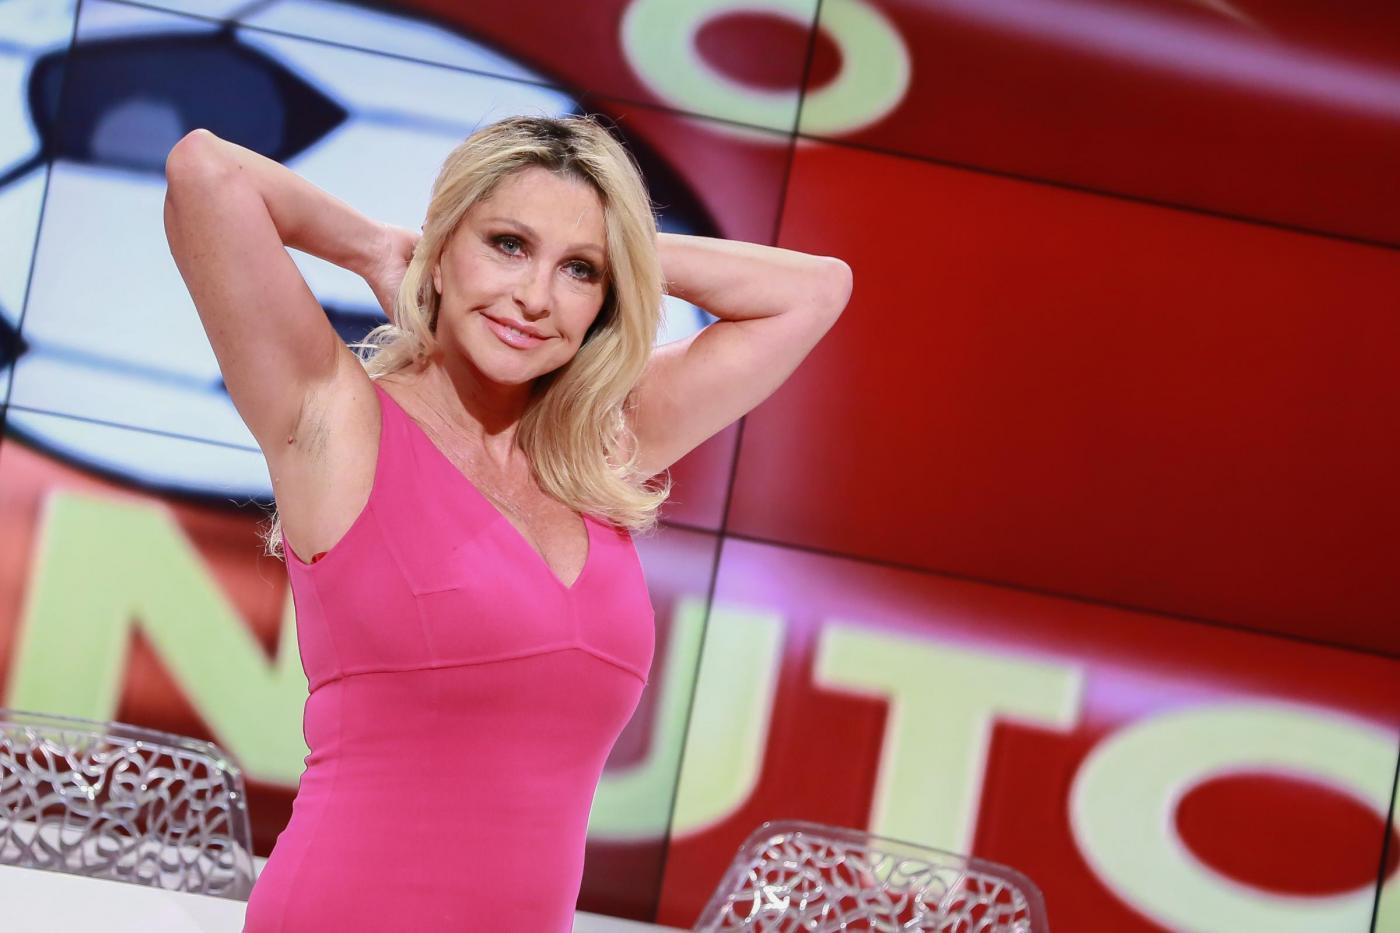 Paola Ferrari età